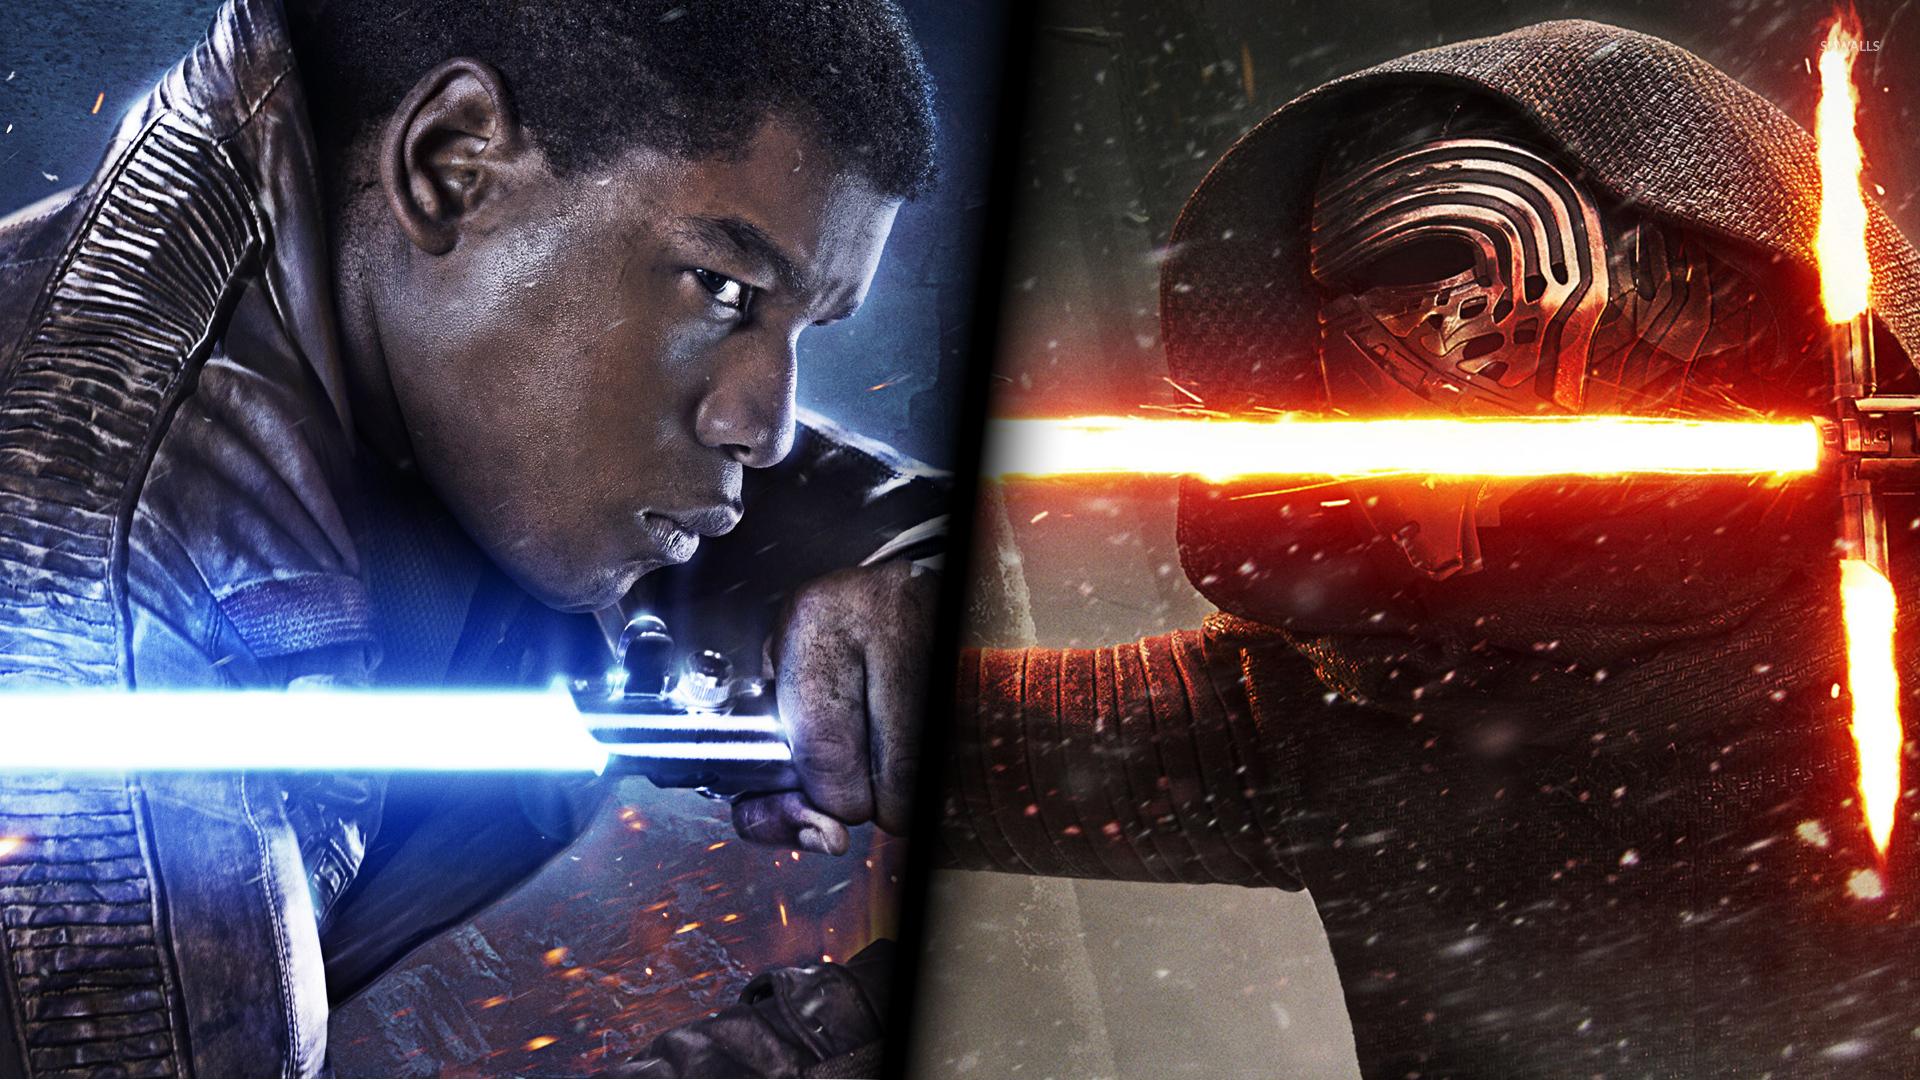 Finn vs Kylo Ren in Star Wars The Force Awakens wallpaper   Movie 1280x800